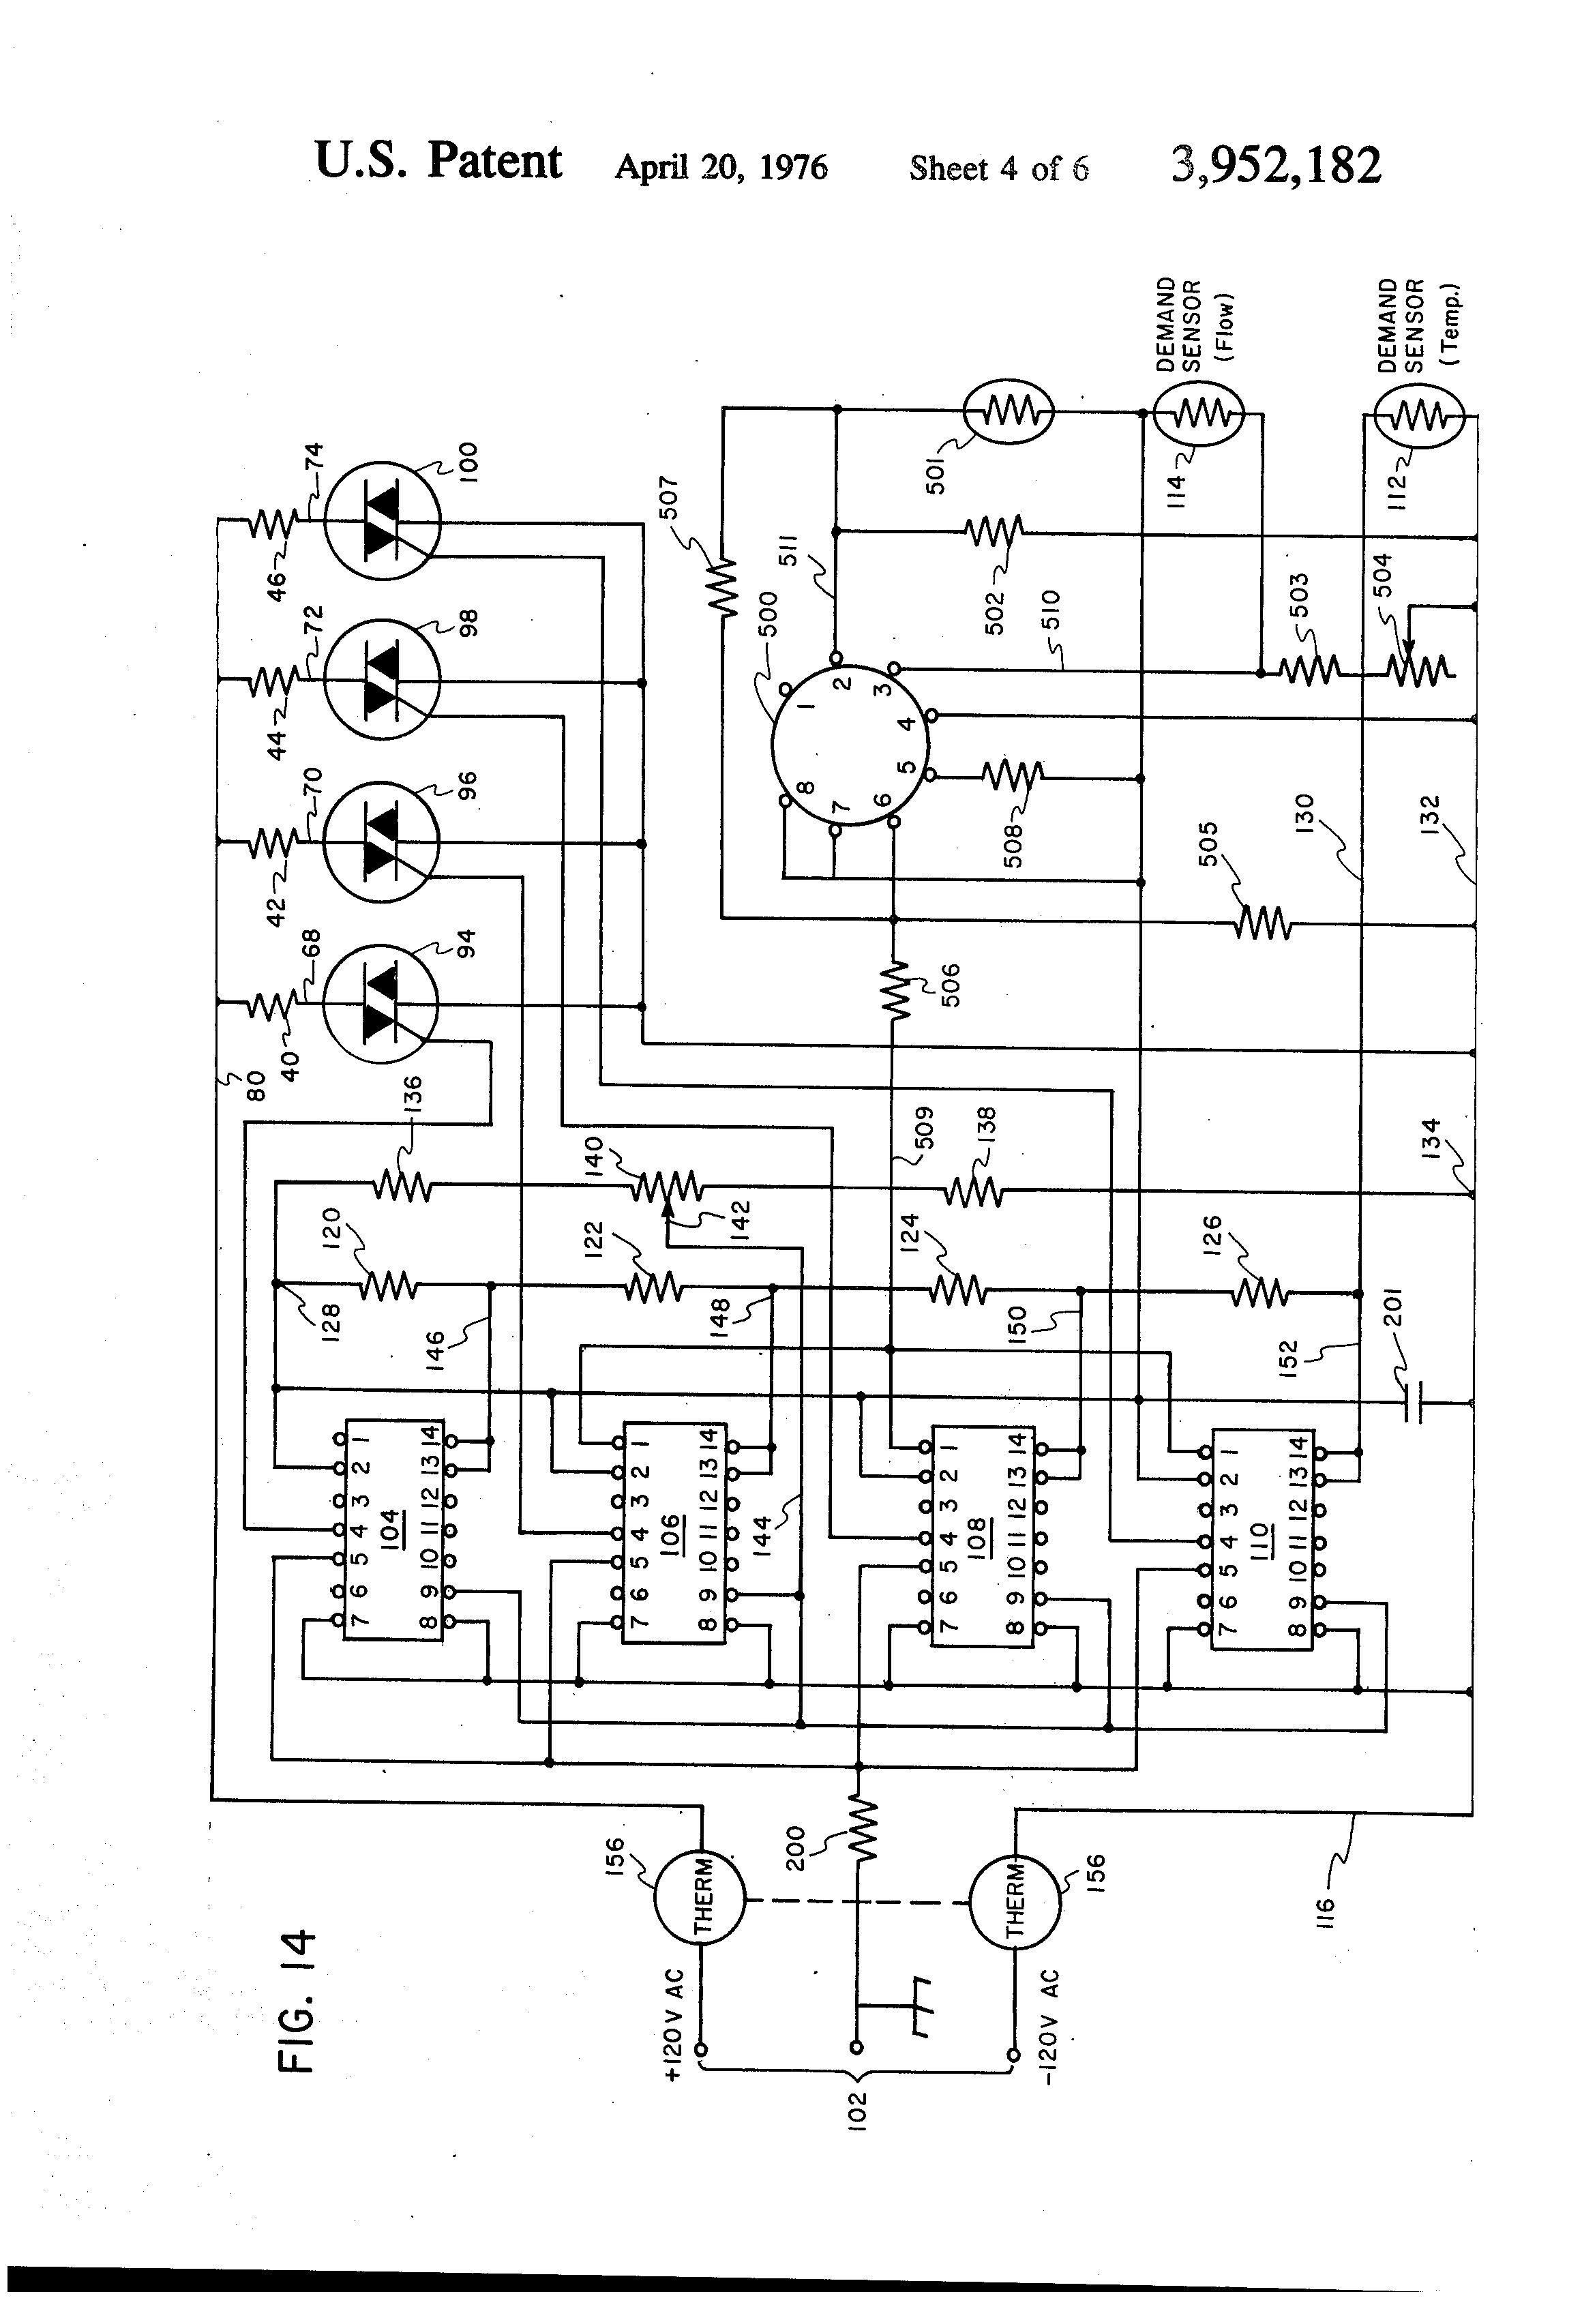 hatco booster heater wiring diagram Download-s54 hatco booster heater wiring diagram wire center u2022 rh wiringgoo co Hatco C 12 Wiring 9-j